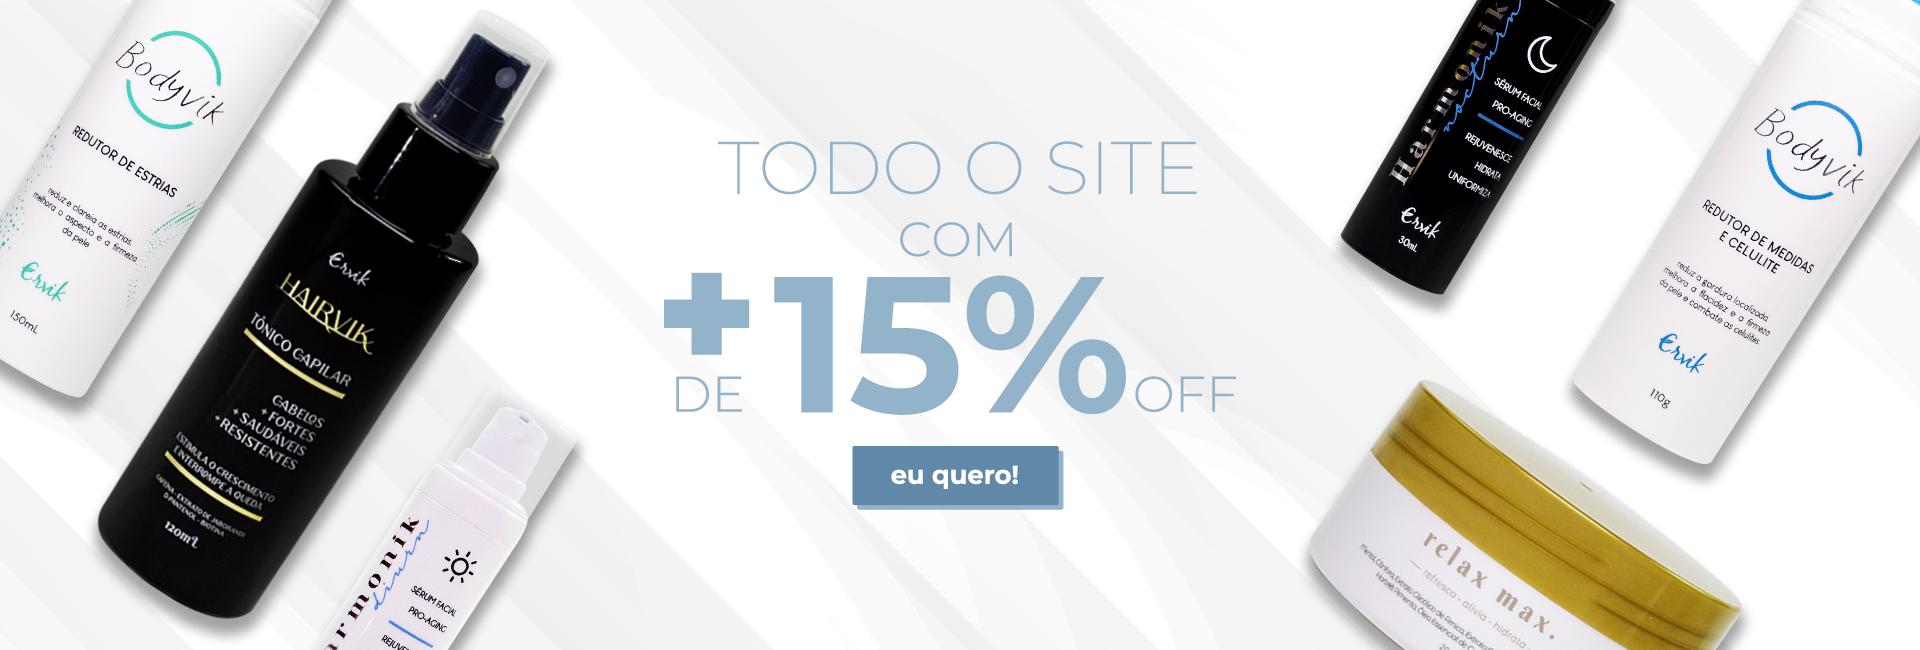 Site todo 15%OFF